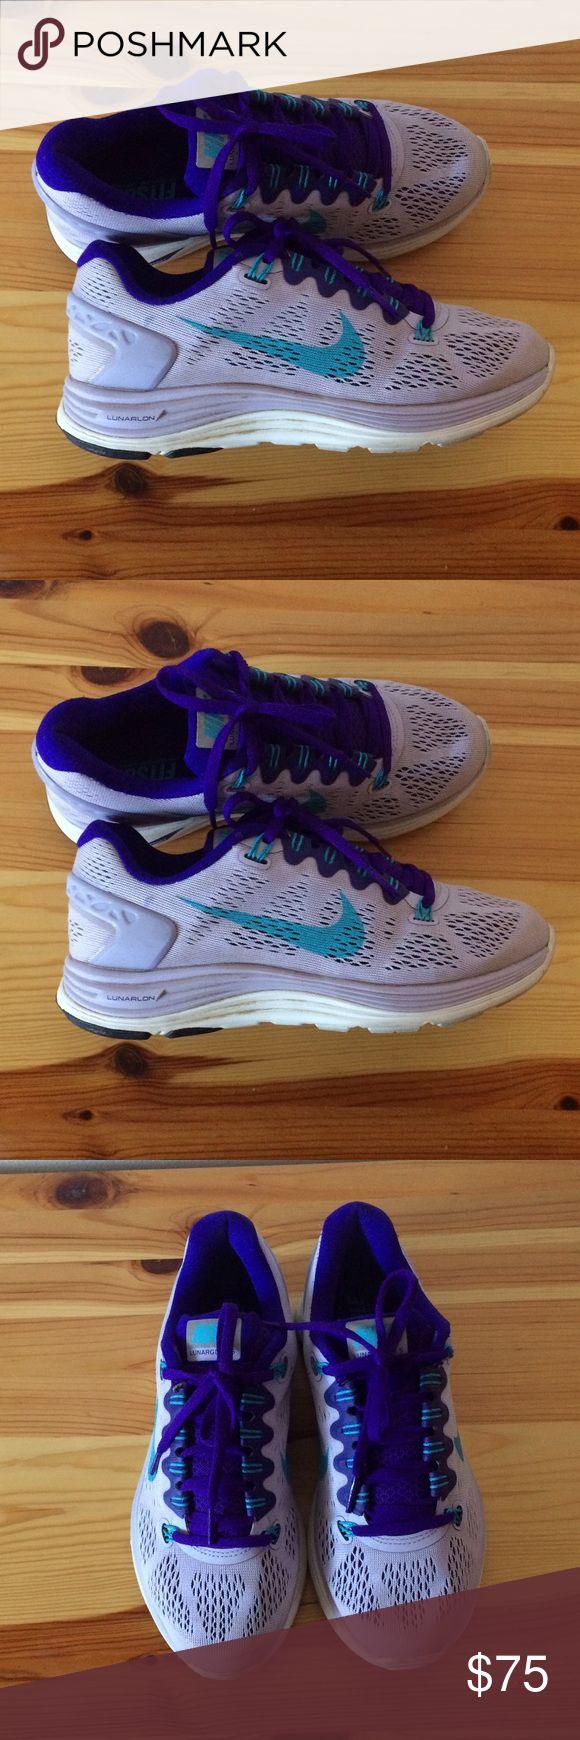 Nike lunar glide sneakers Woman's Nike lunar glides in purple woman's 6.5 Nike Shoes Sneakers